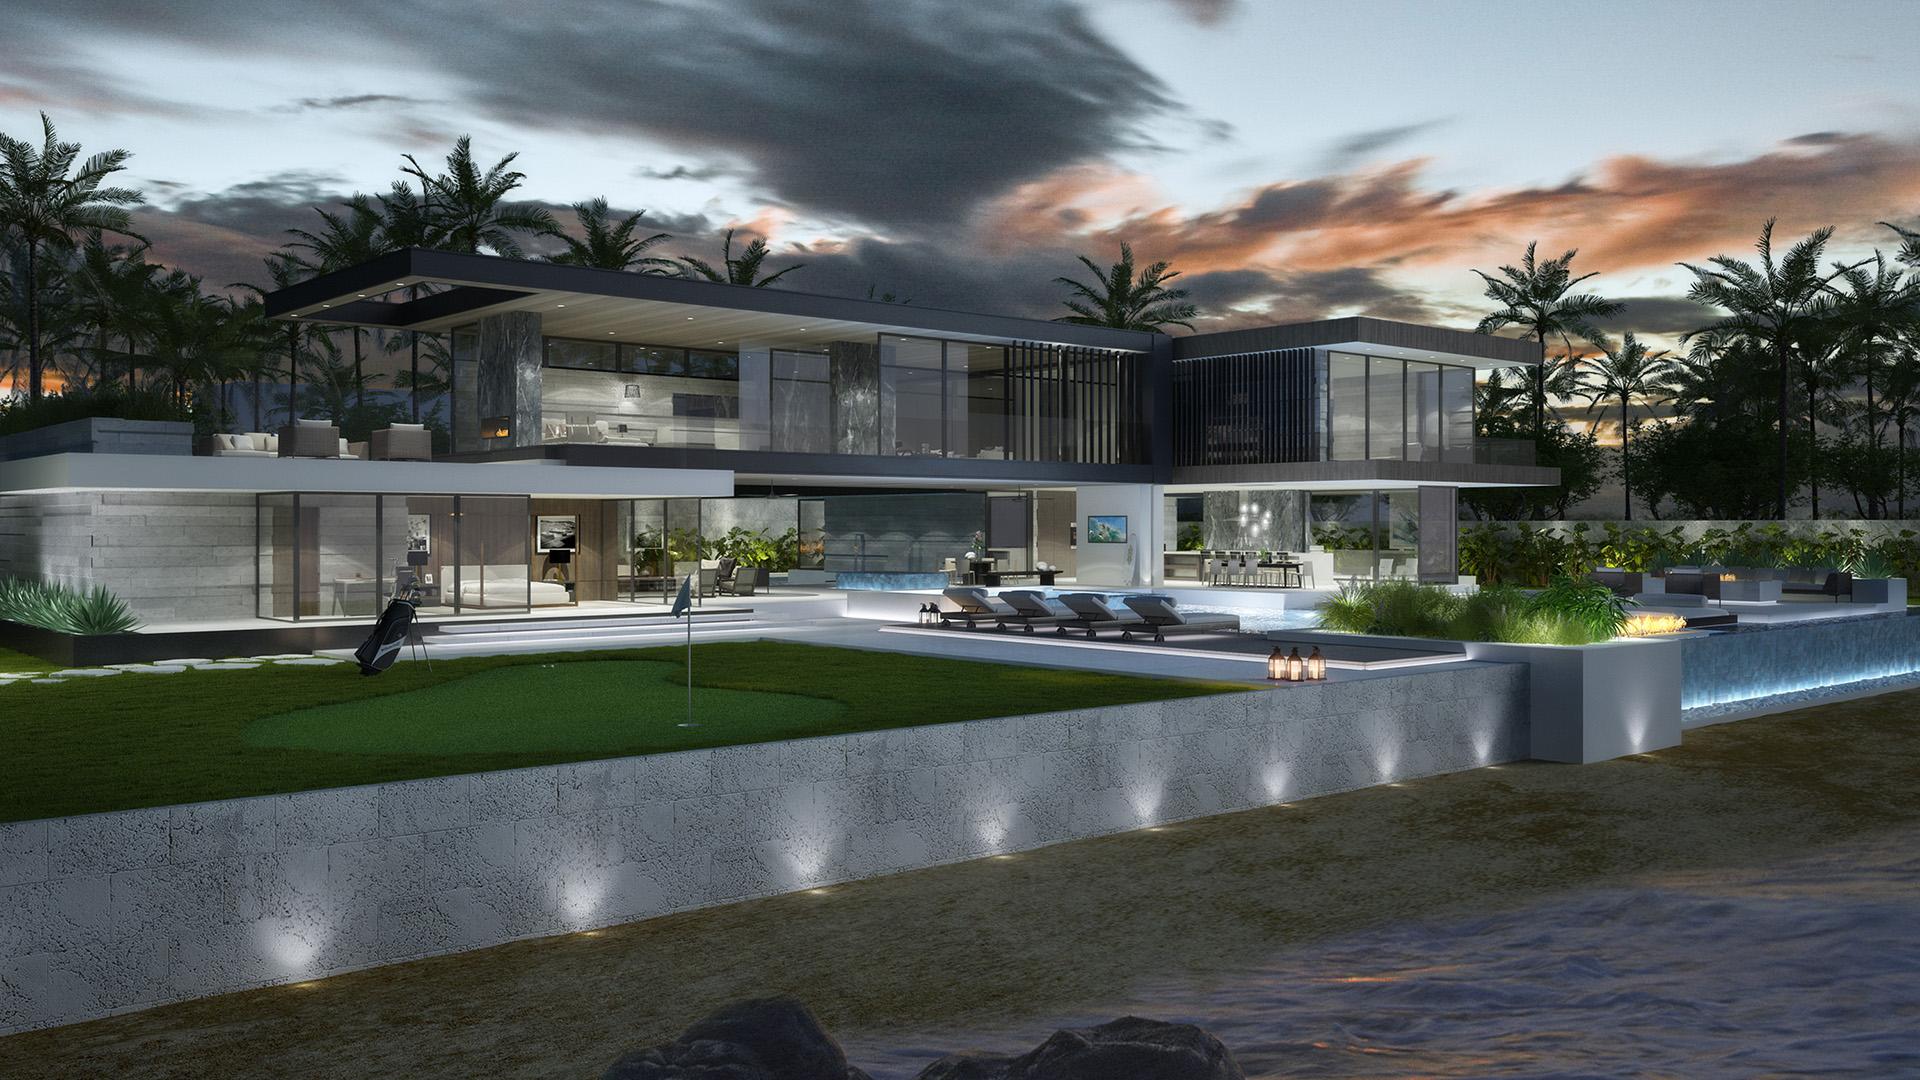 Beach House Los Angeles Visualisation